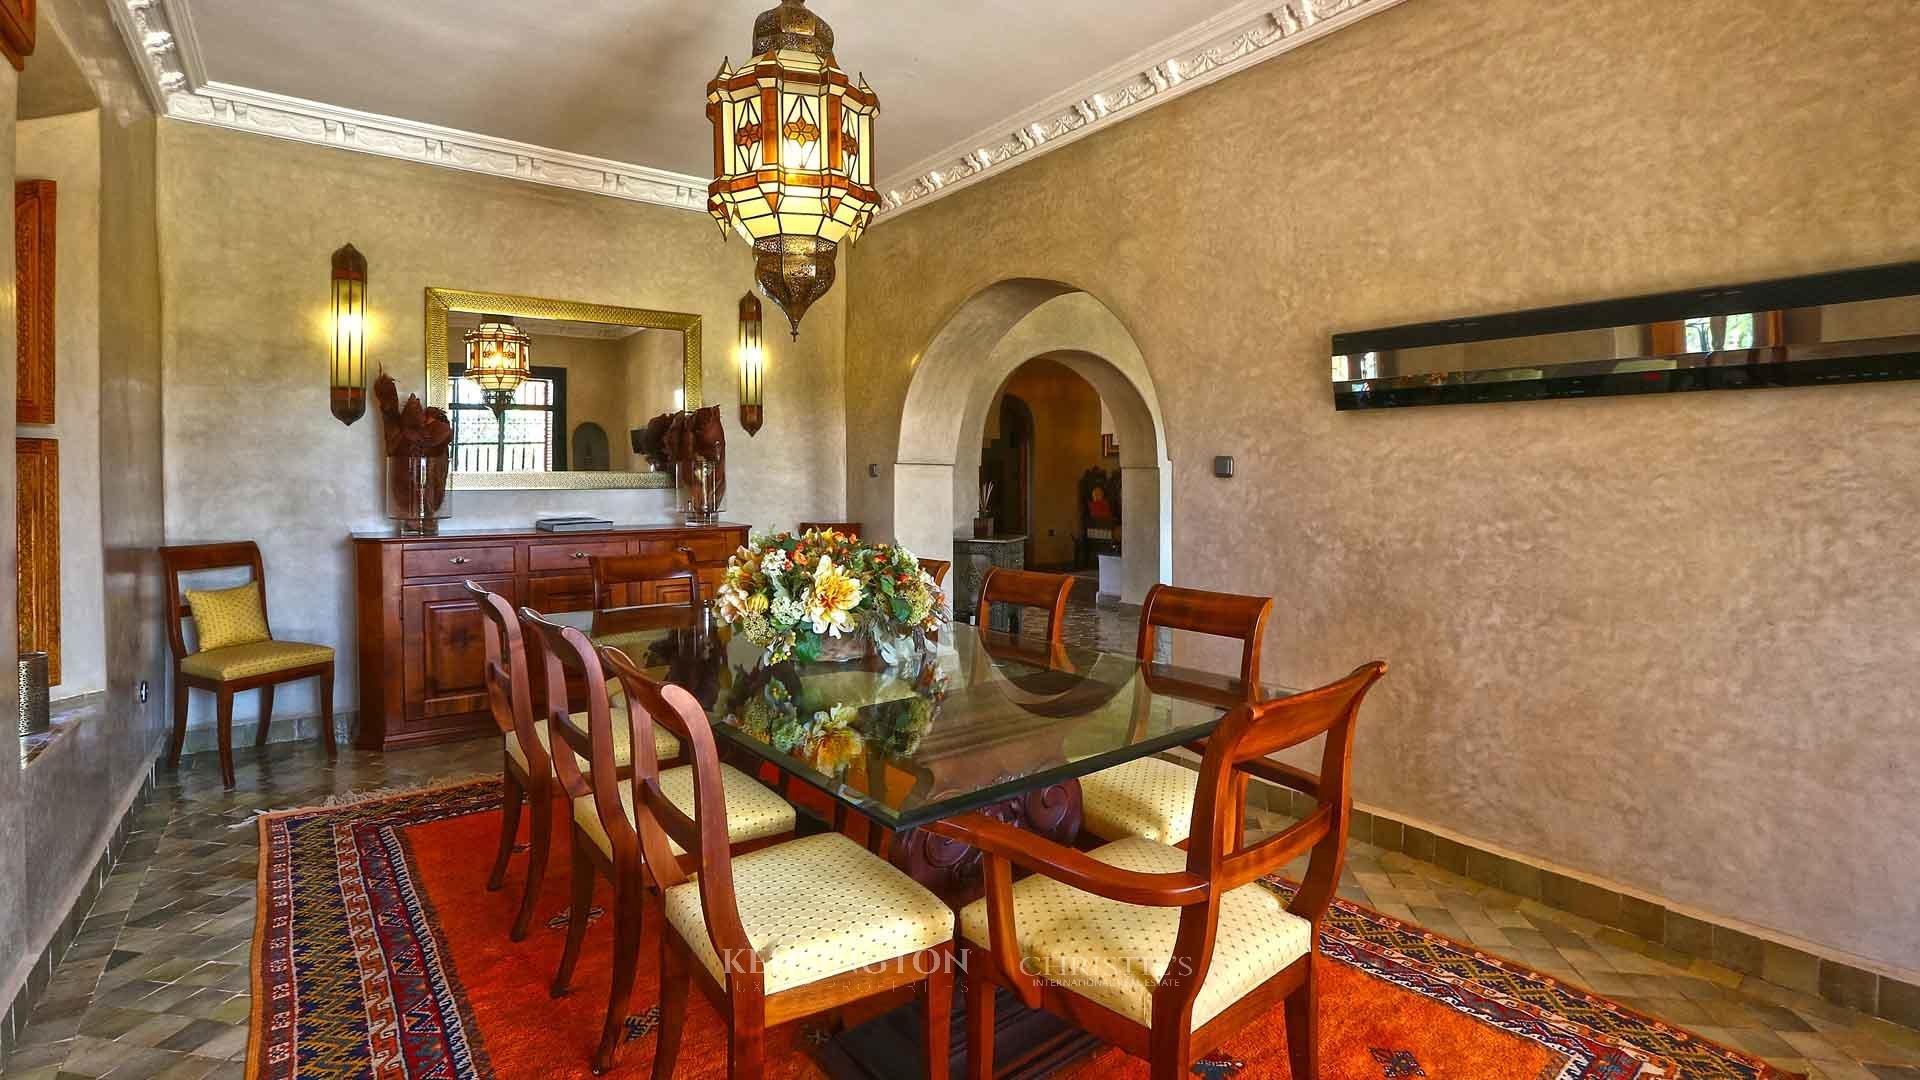 KPPM01324: Villa Lya Luxury Villa Marrakech Morocco